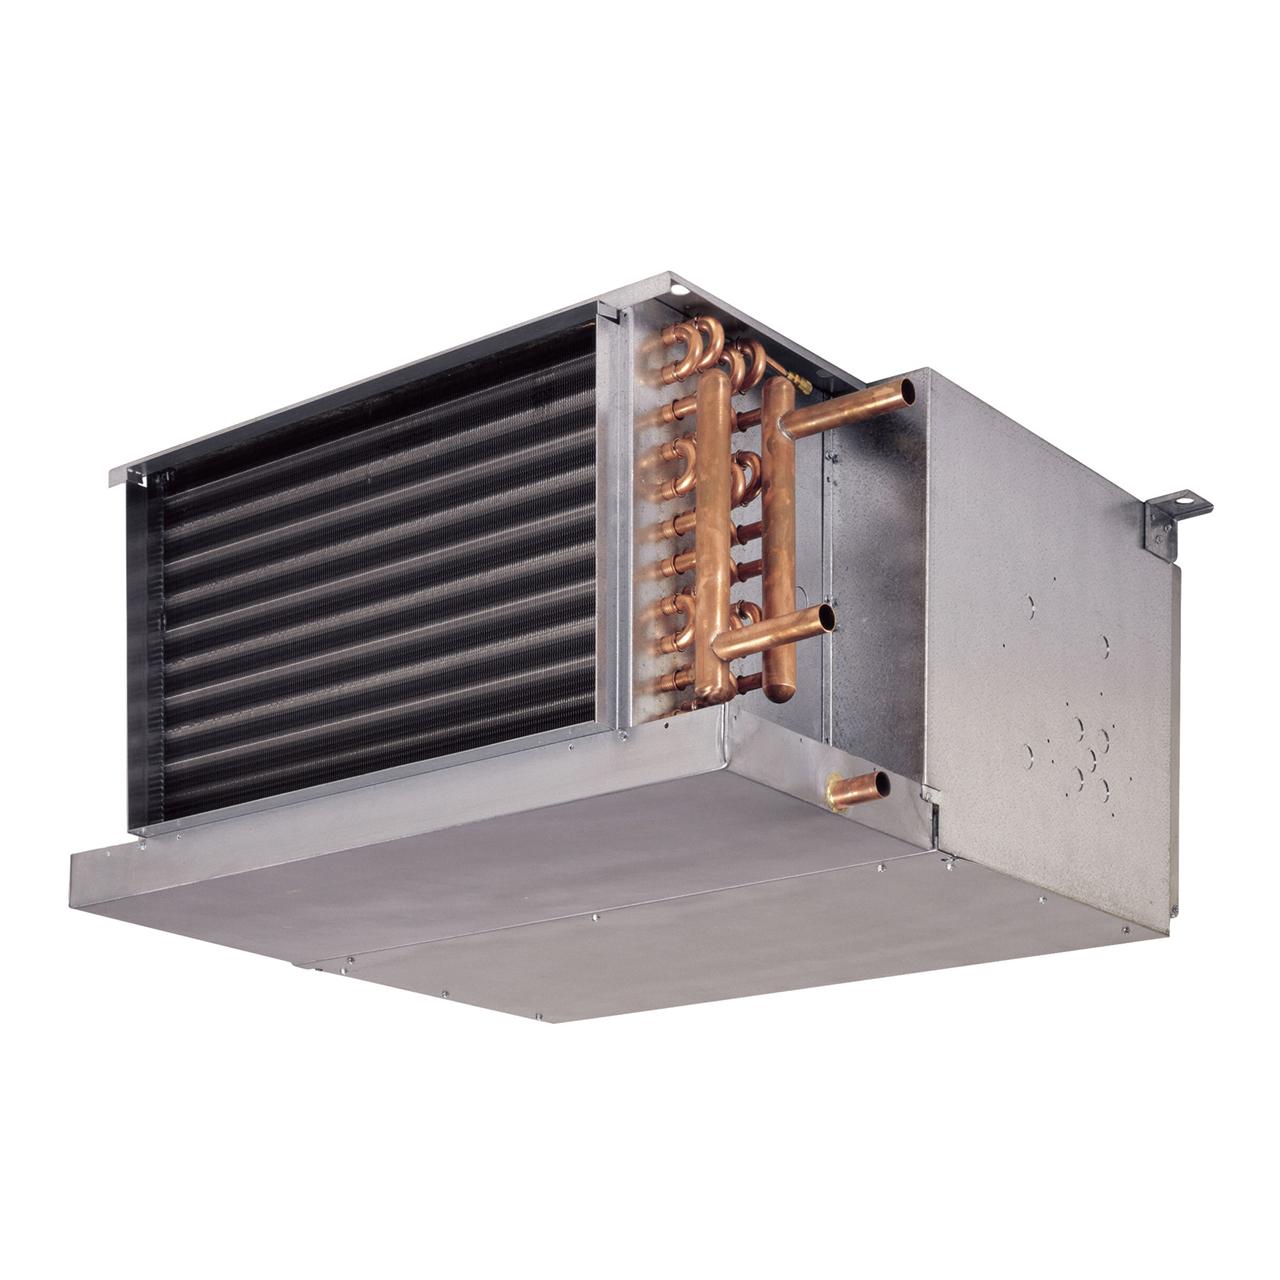 carrier-42DV-vertical-direct-drive-blower-coil